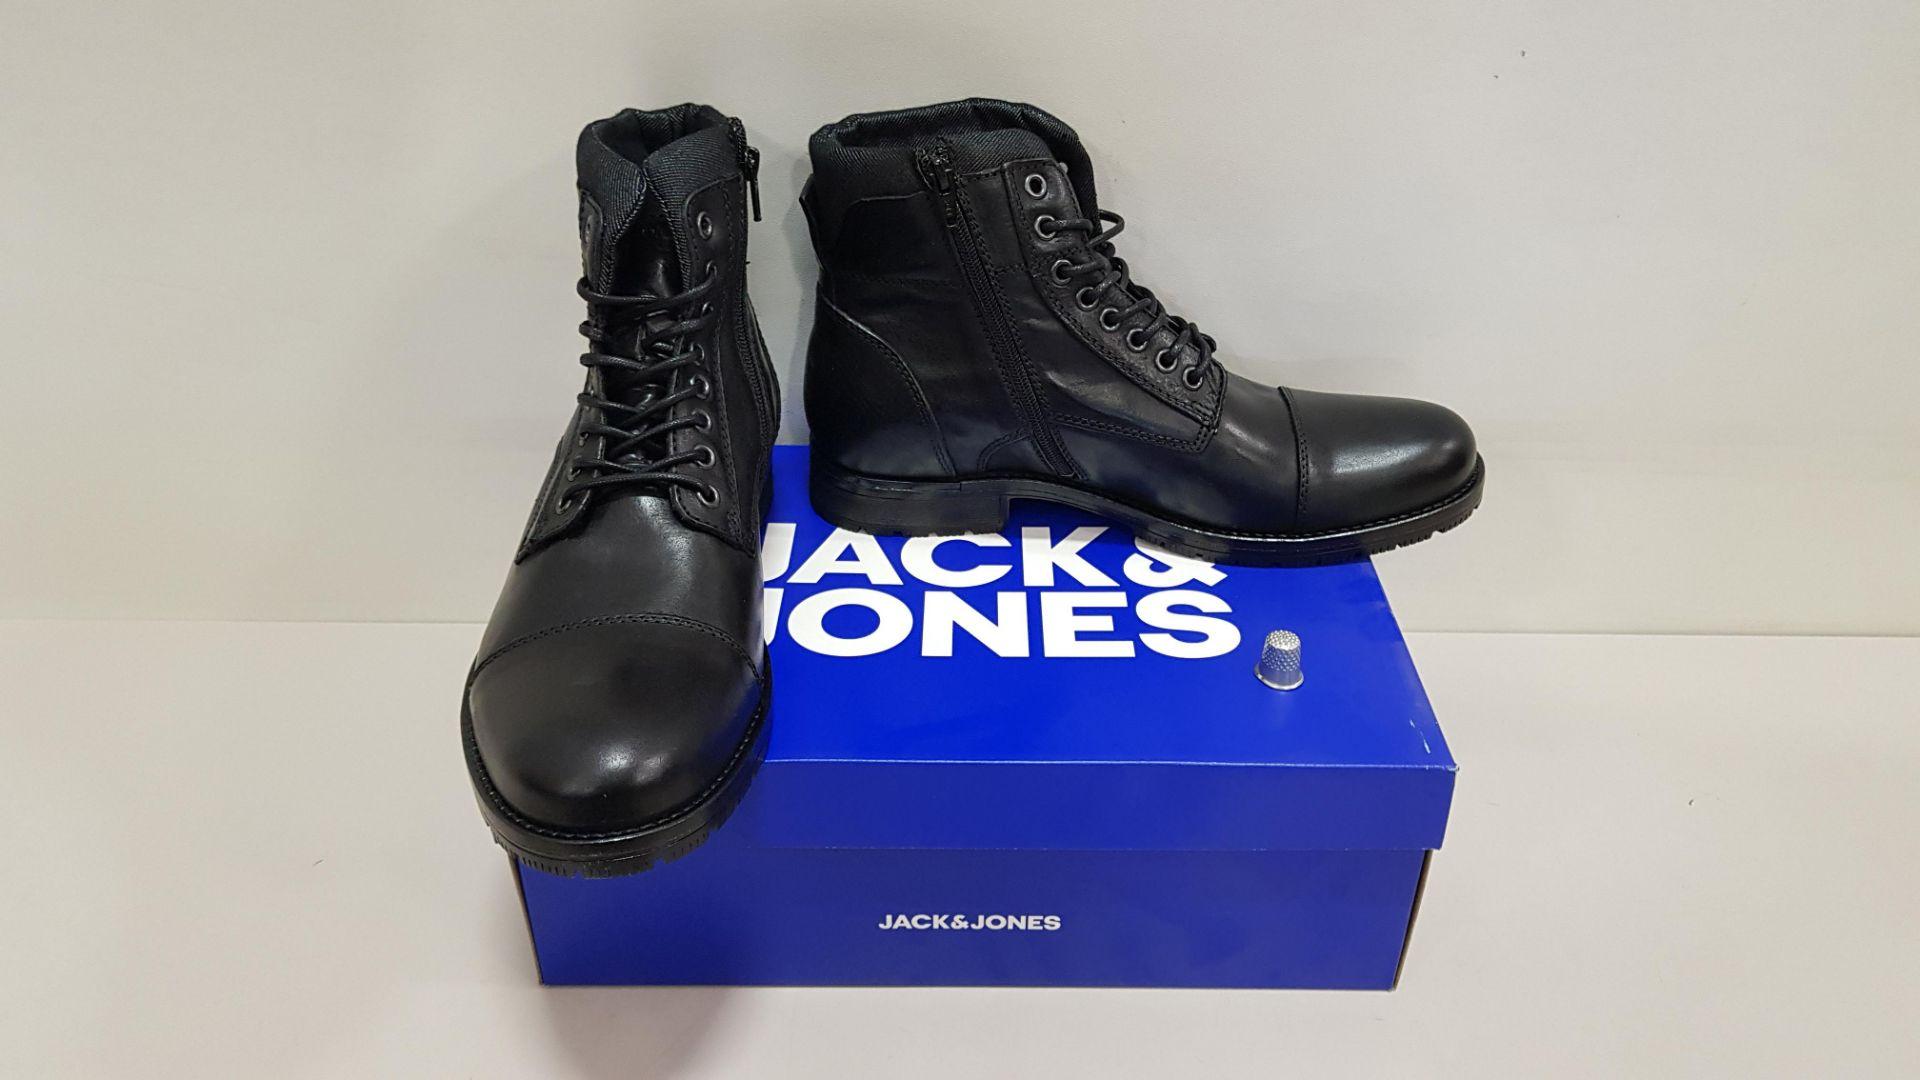 5 X BRAND NEW JACK & JONES BLACK BOOTS UK SIZE 8 RRP £90.00 (TOTAL RRP £450.00)